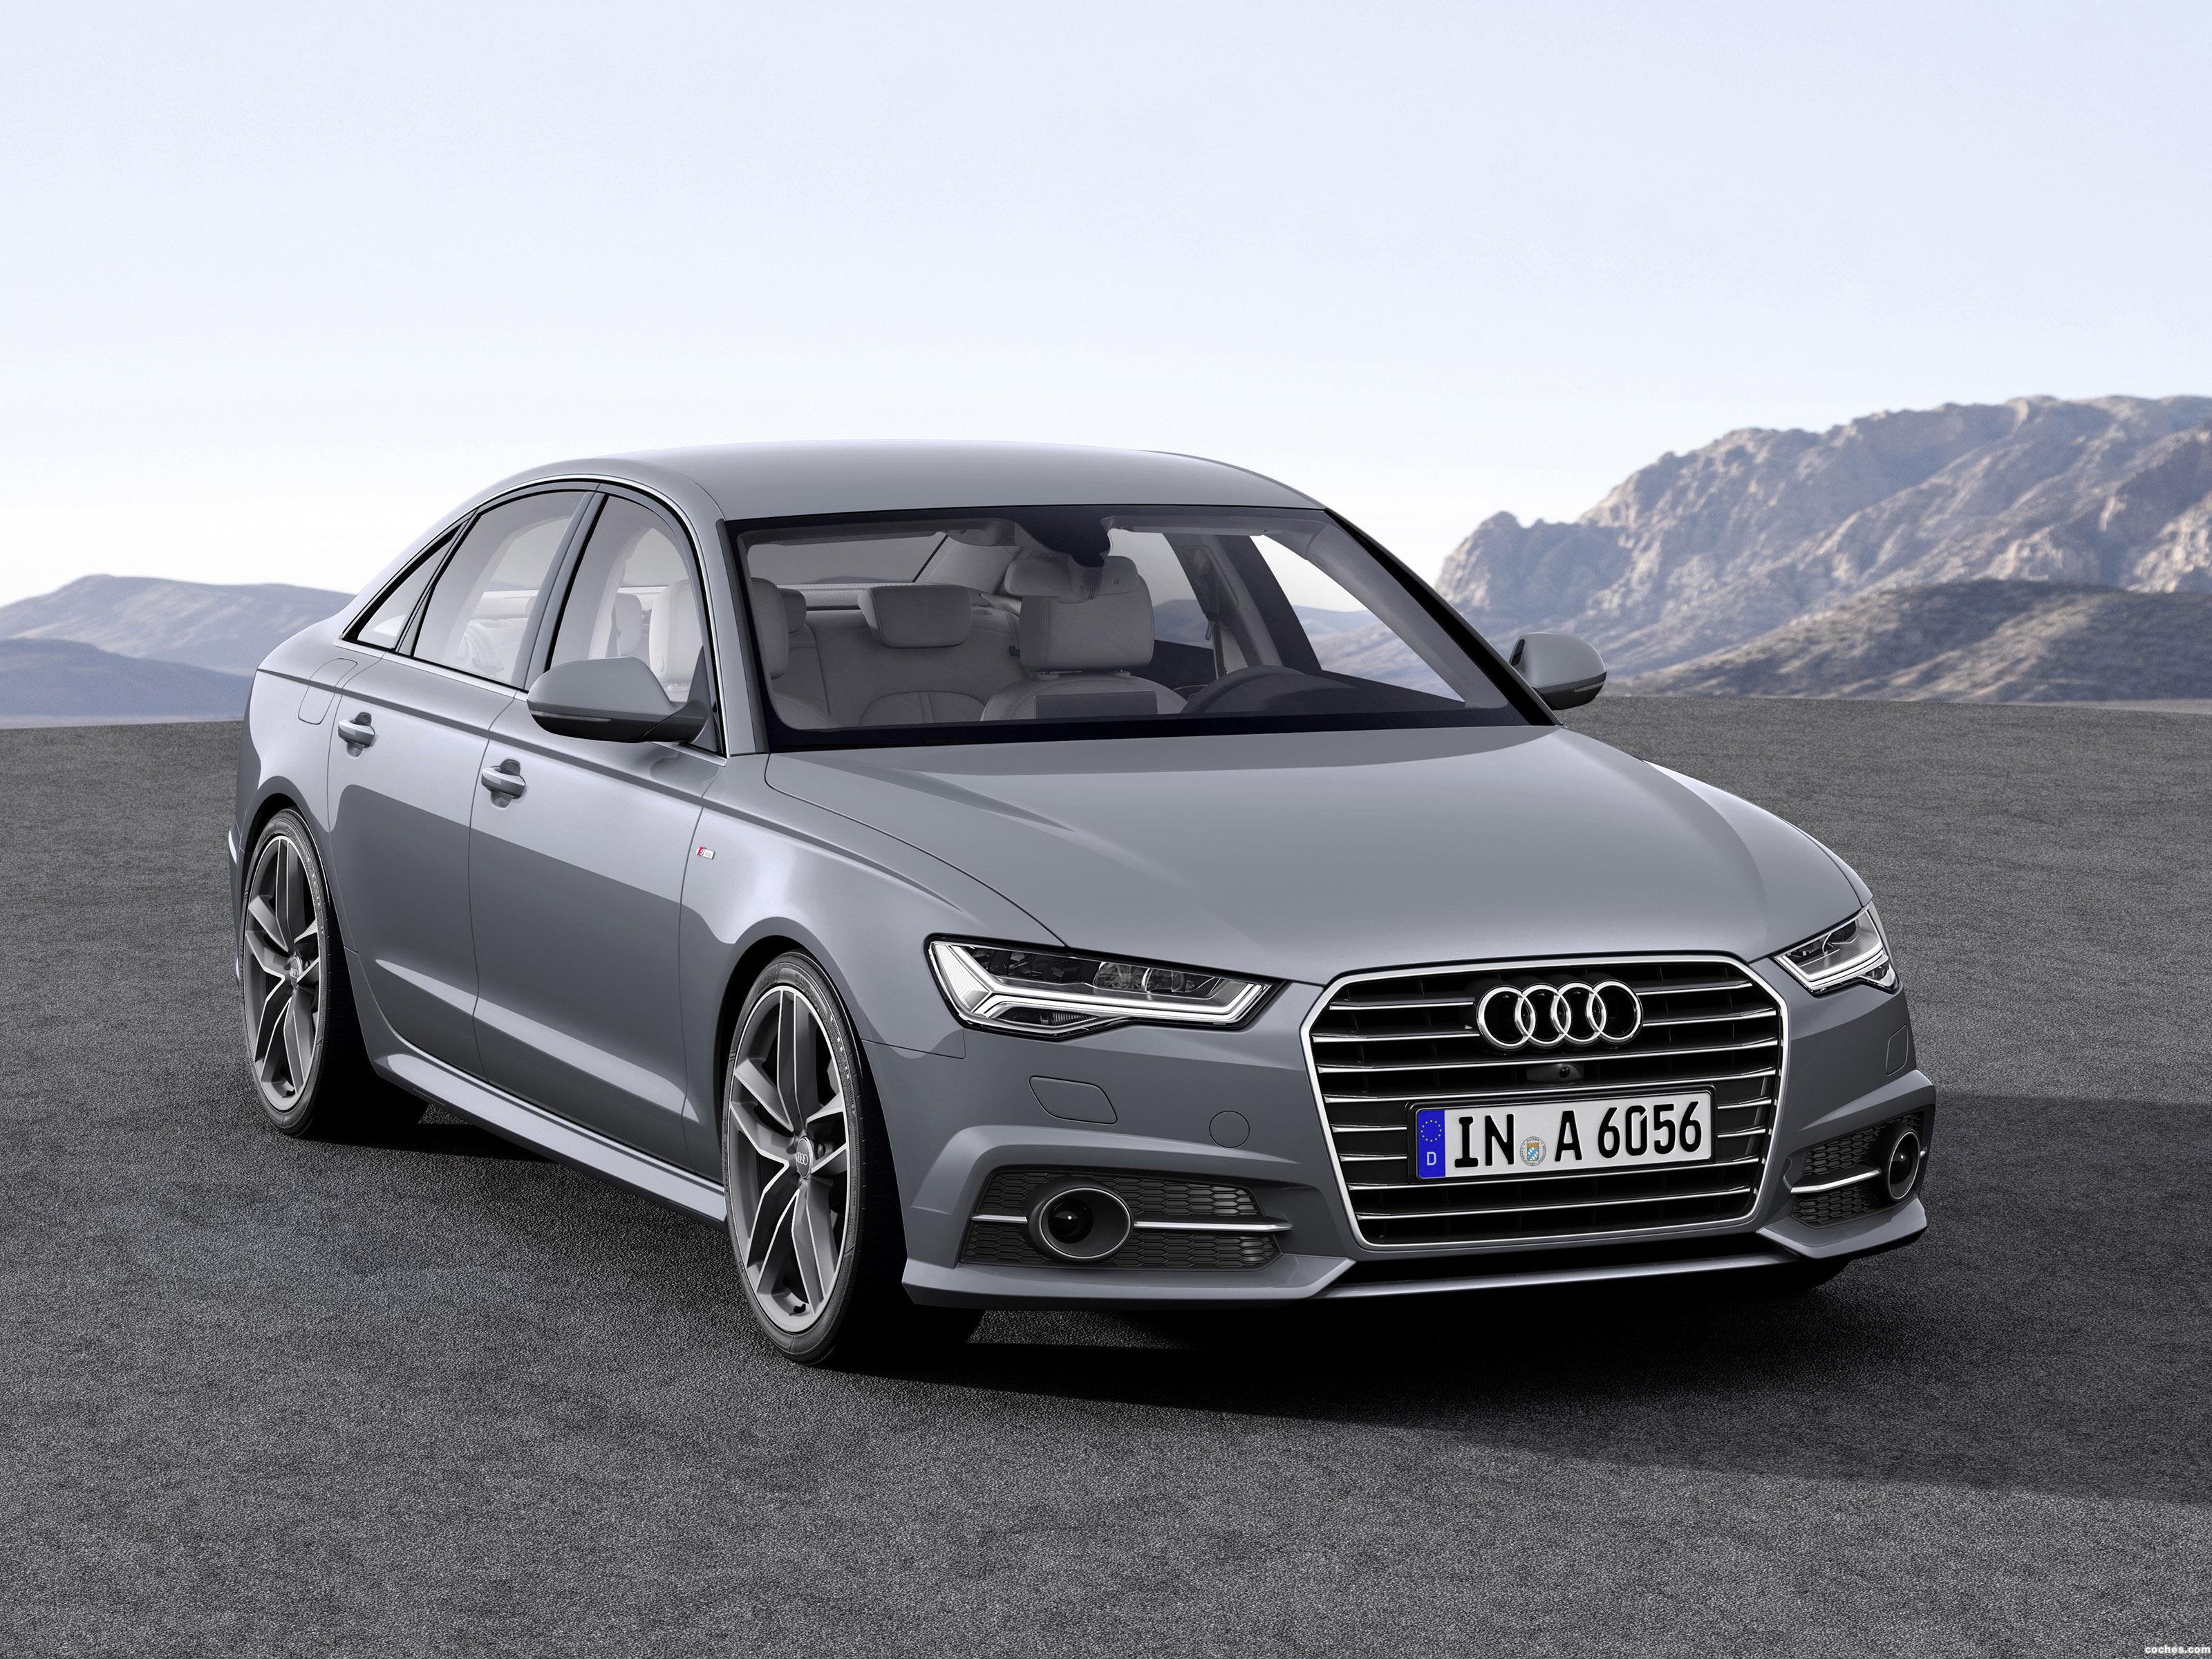 Foto 0 de Audi A6 TFSI Ultra S Line 2015